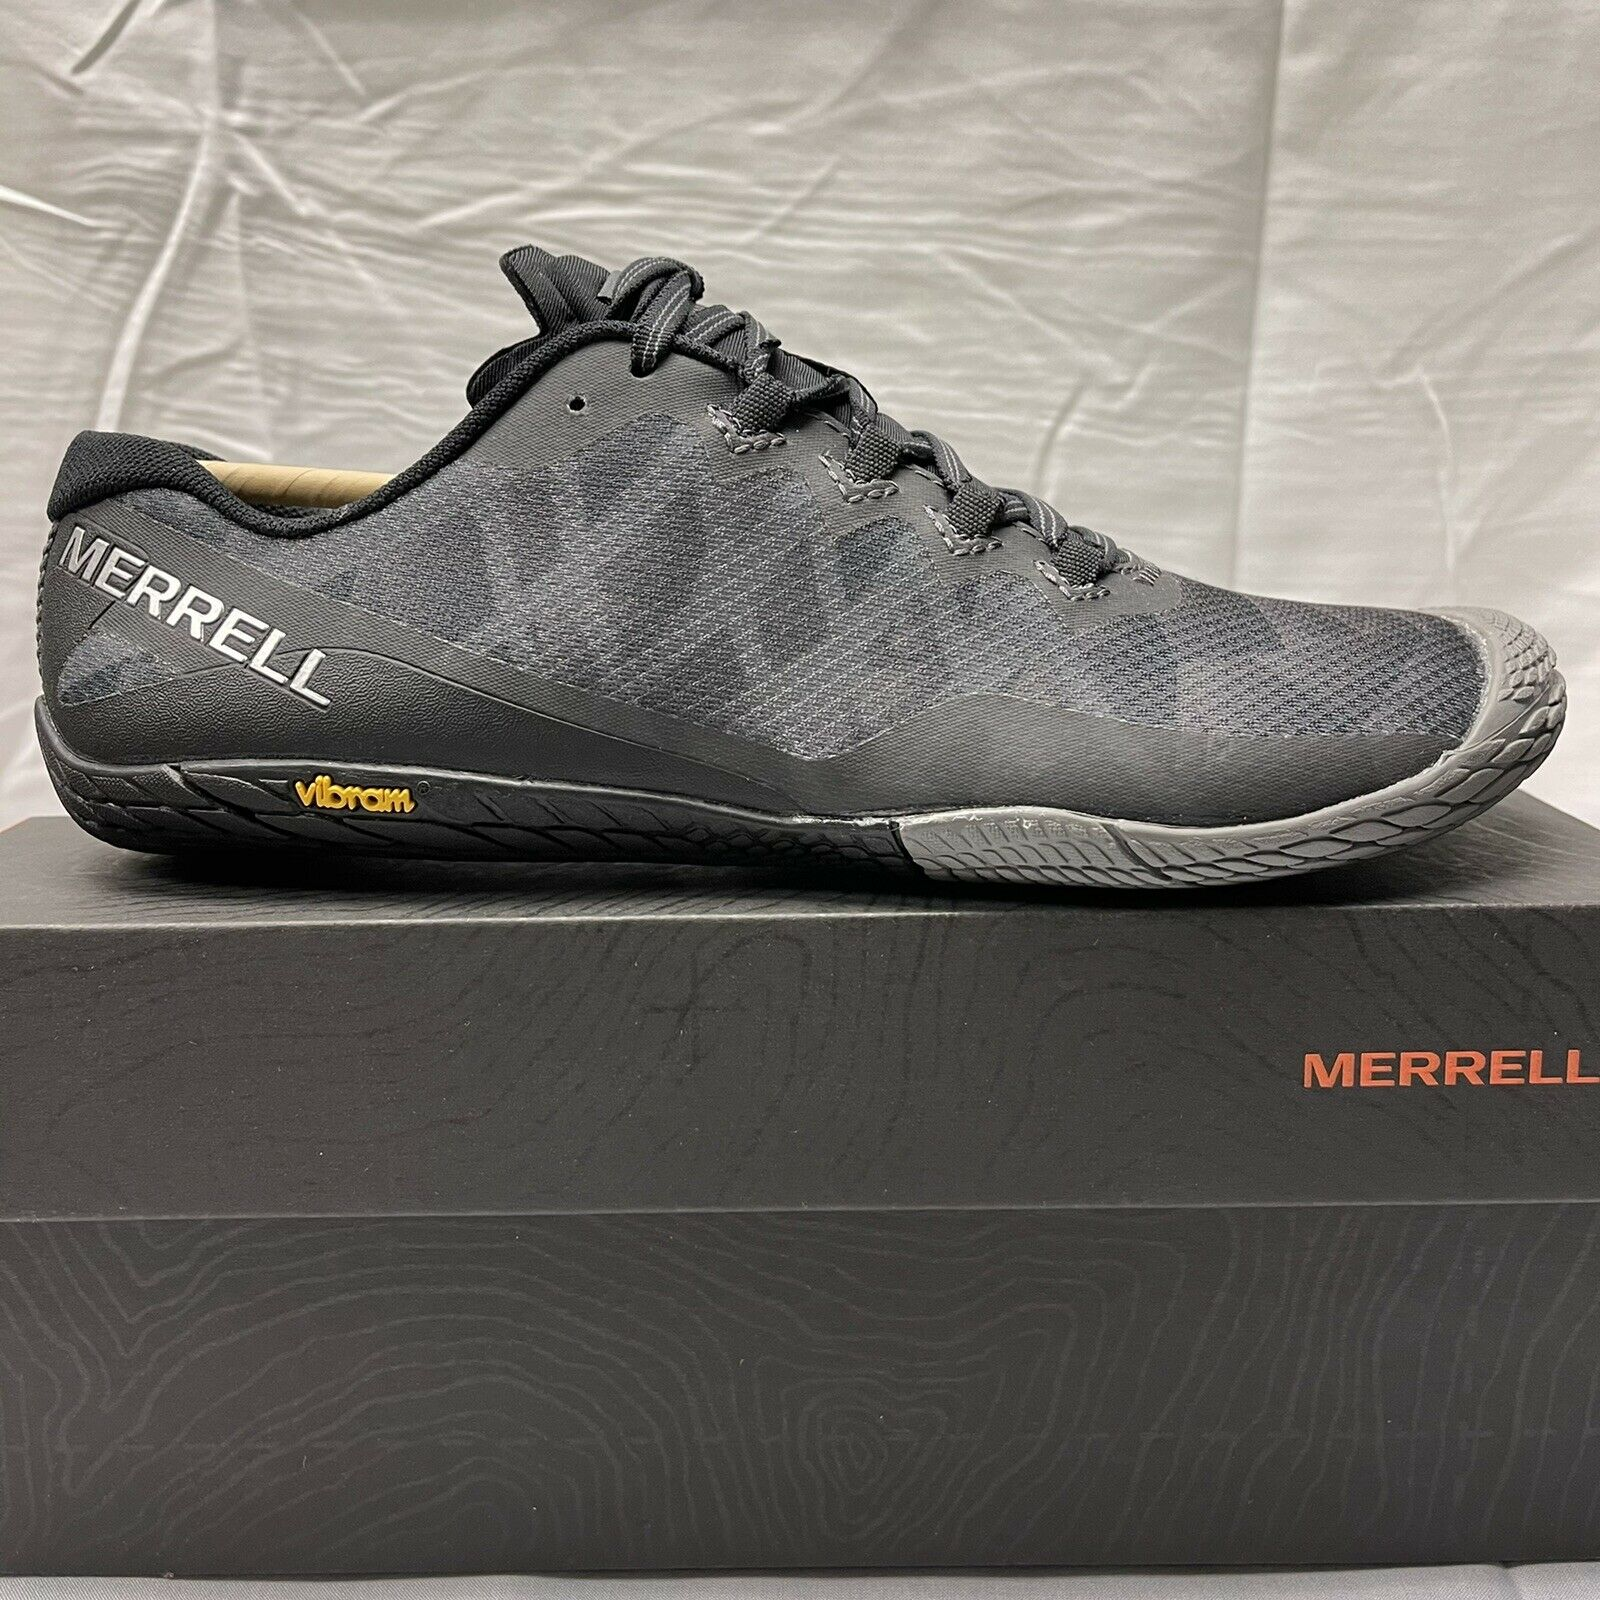 Merrell Vapor Glove 3 J12674 Pieds Nus Chaussures De Course Noir Femme Taille 10